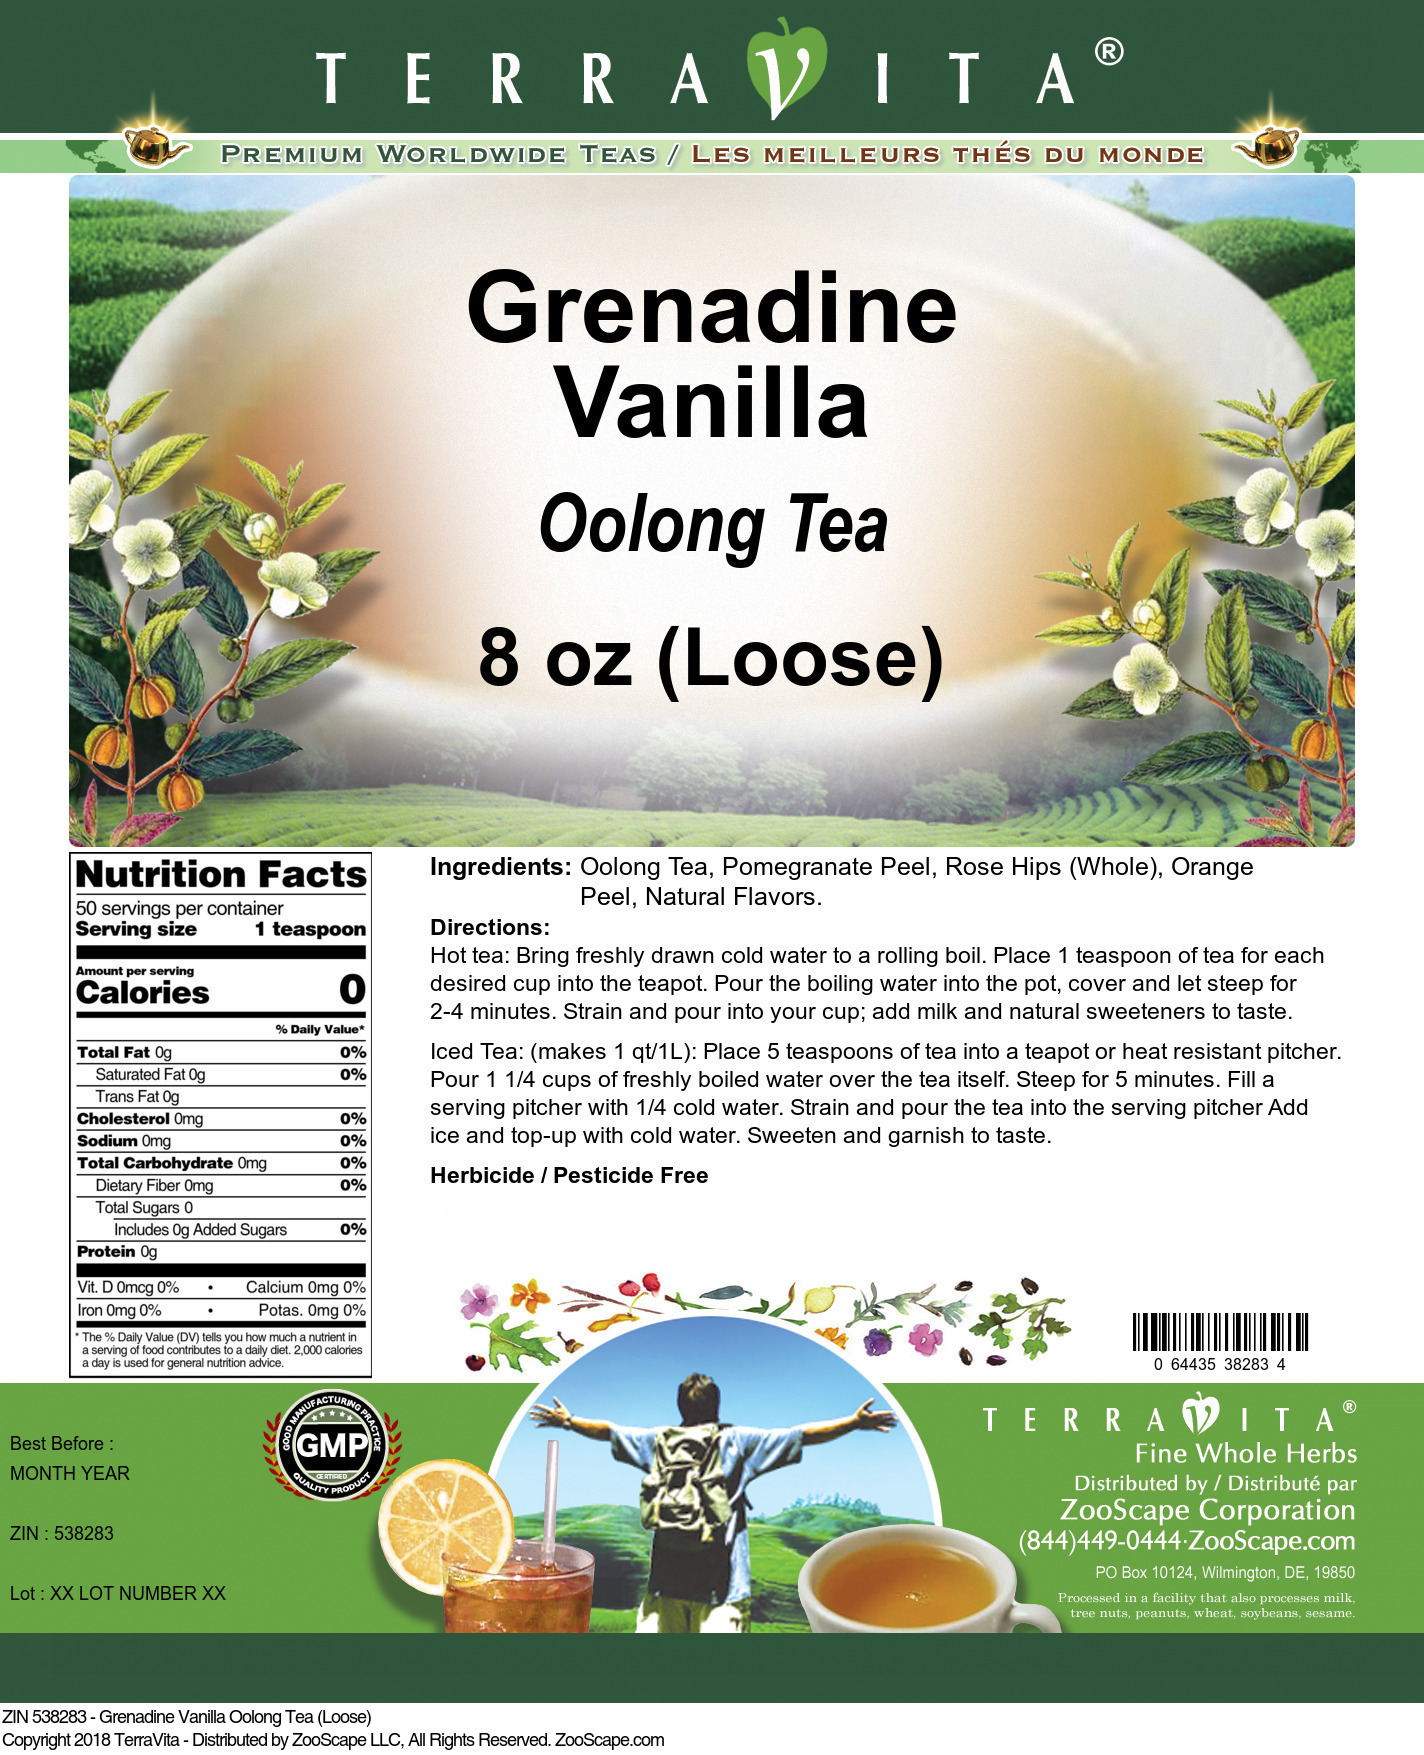 Grenadine Vanilla Oolong Tea (Loose)